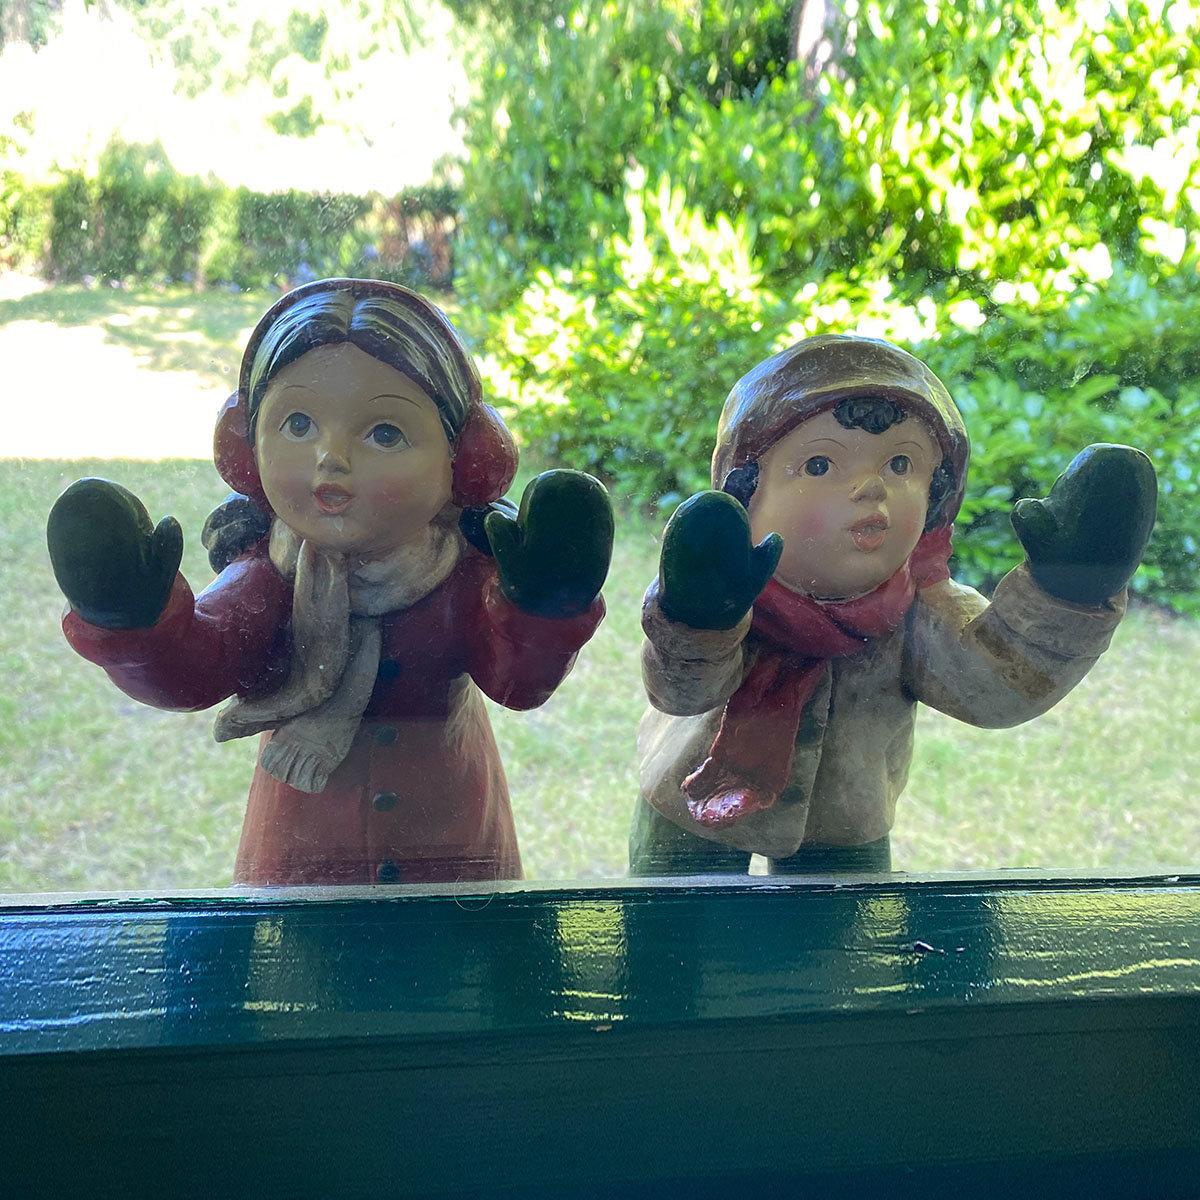 Fenstergucker Winterkinder, 2er Set, groß